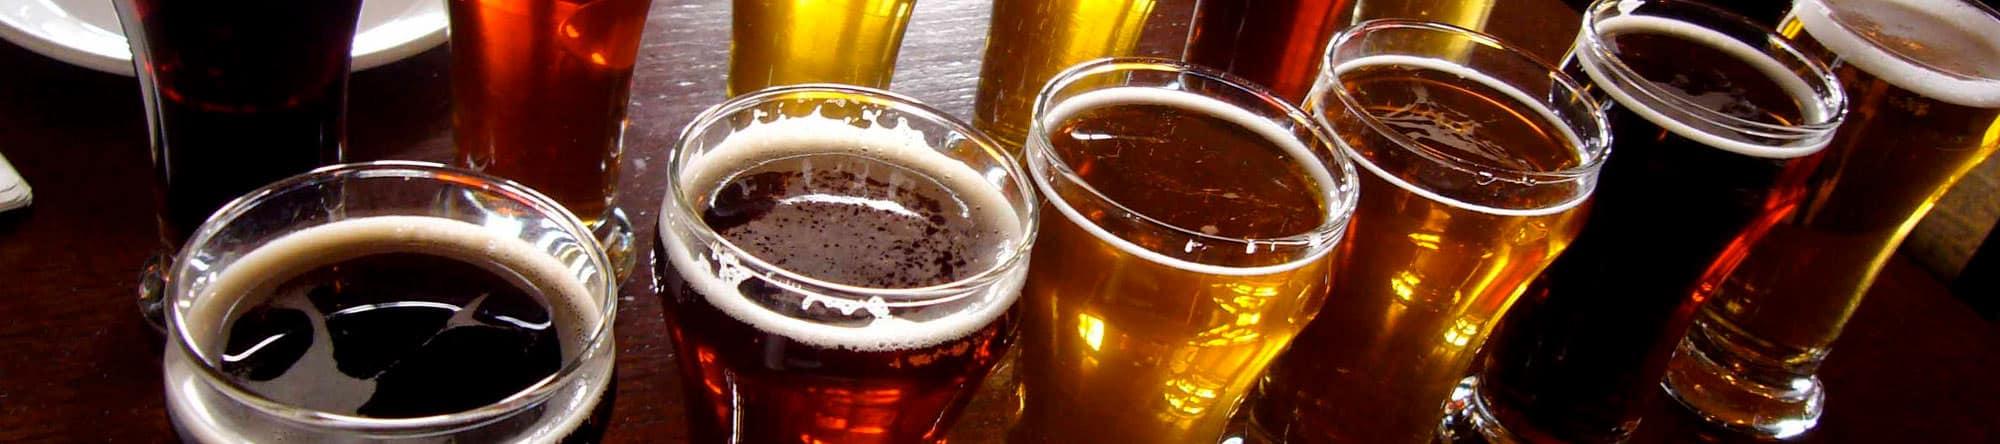 beer flight Flickr photo by Paul Joseph - posted at https://goo.gl/opZ9Fv